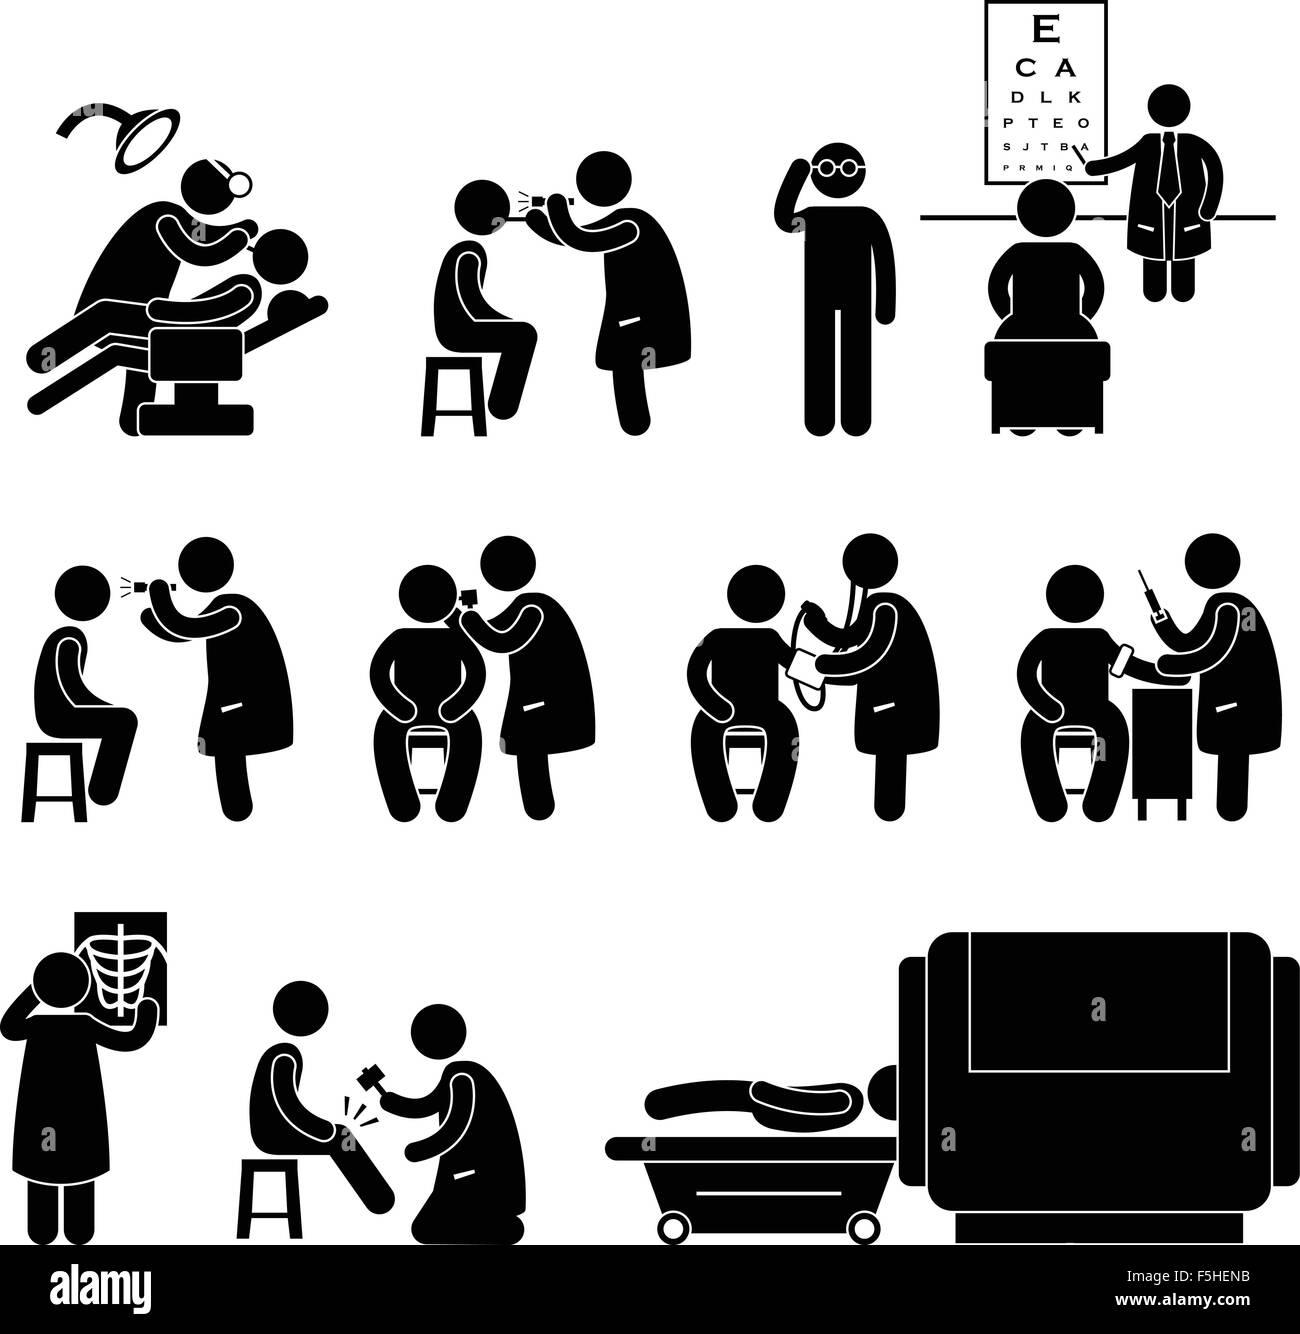 Health Medical Body Check Up Examination Test Icon Symbol Sign Stock